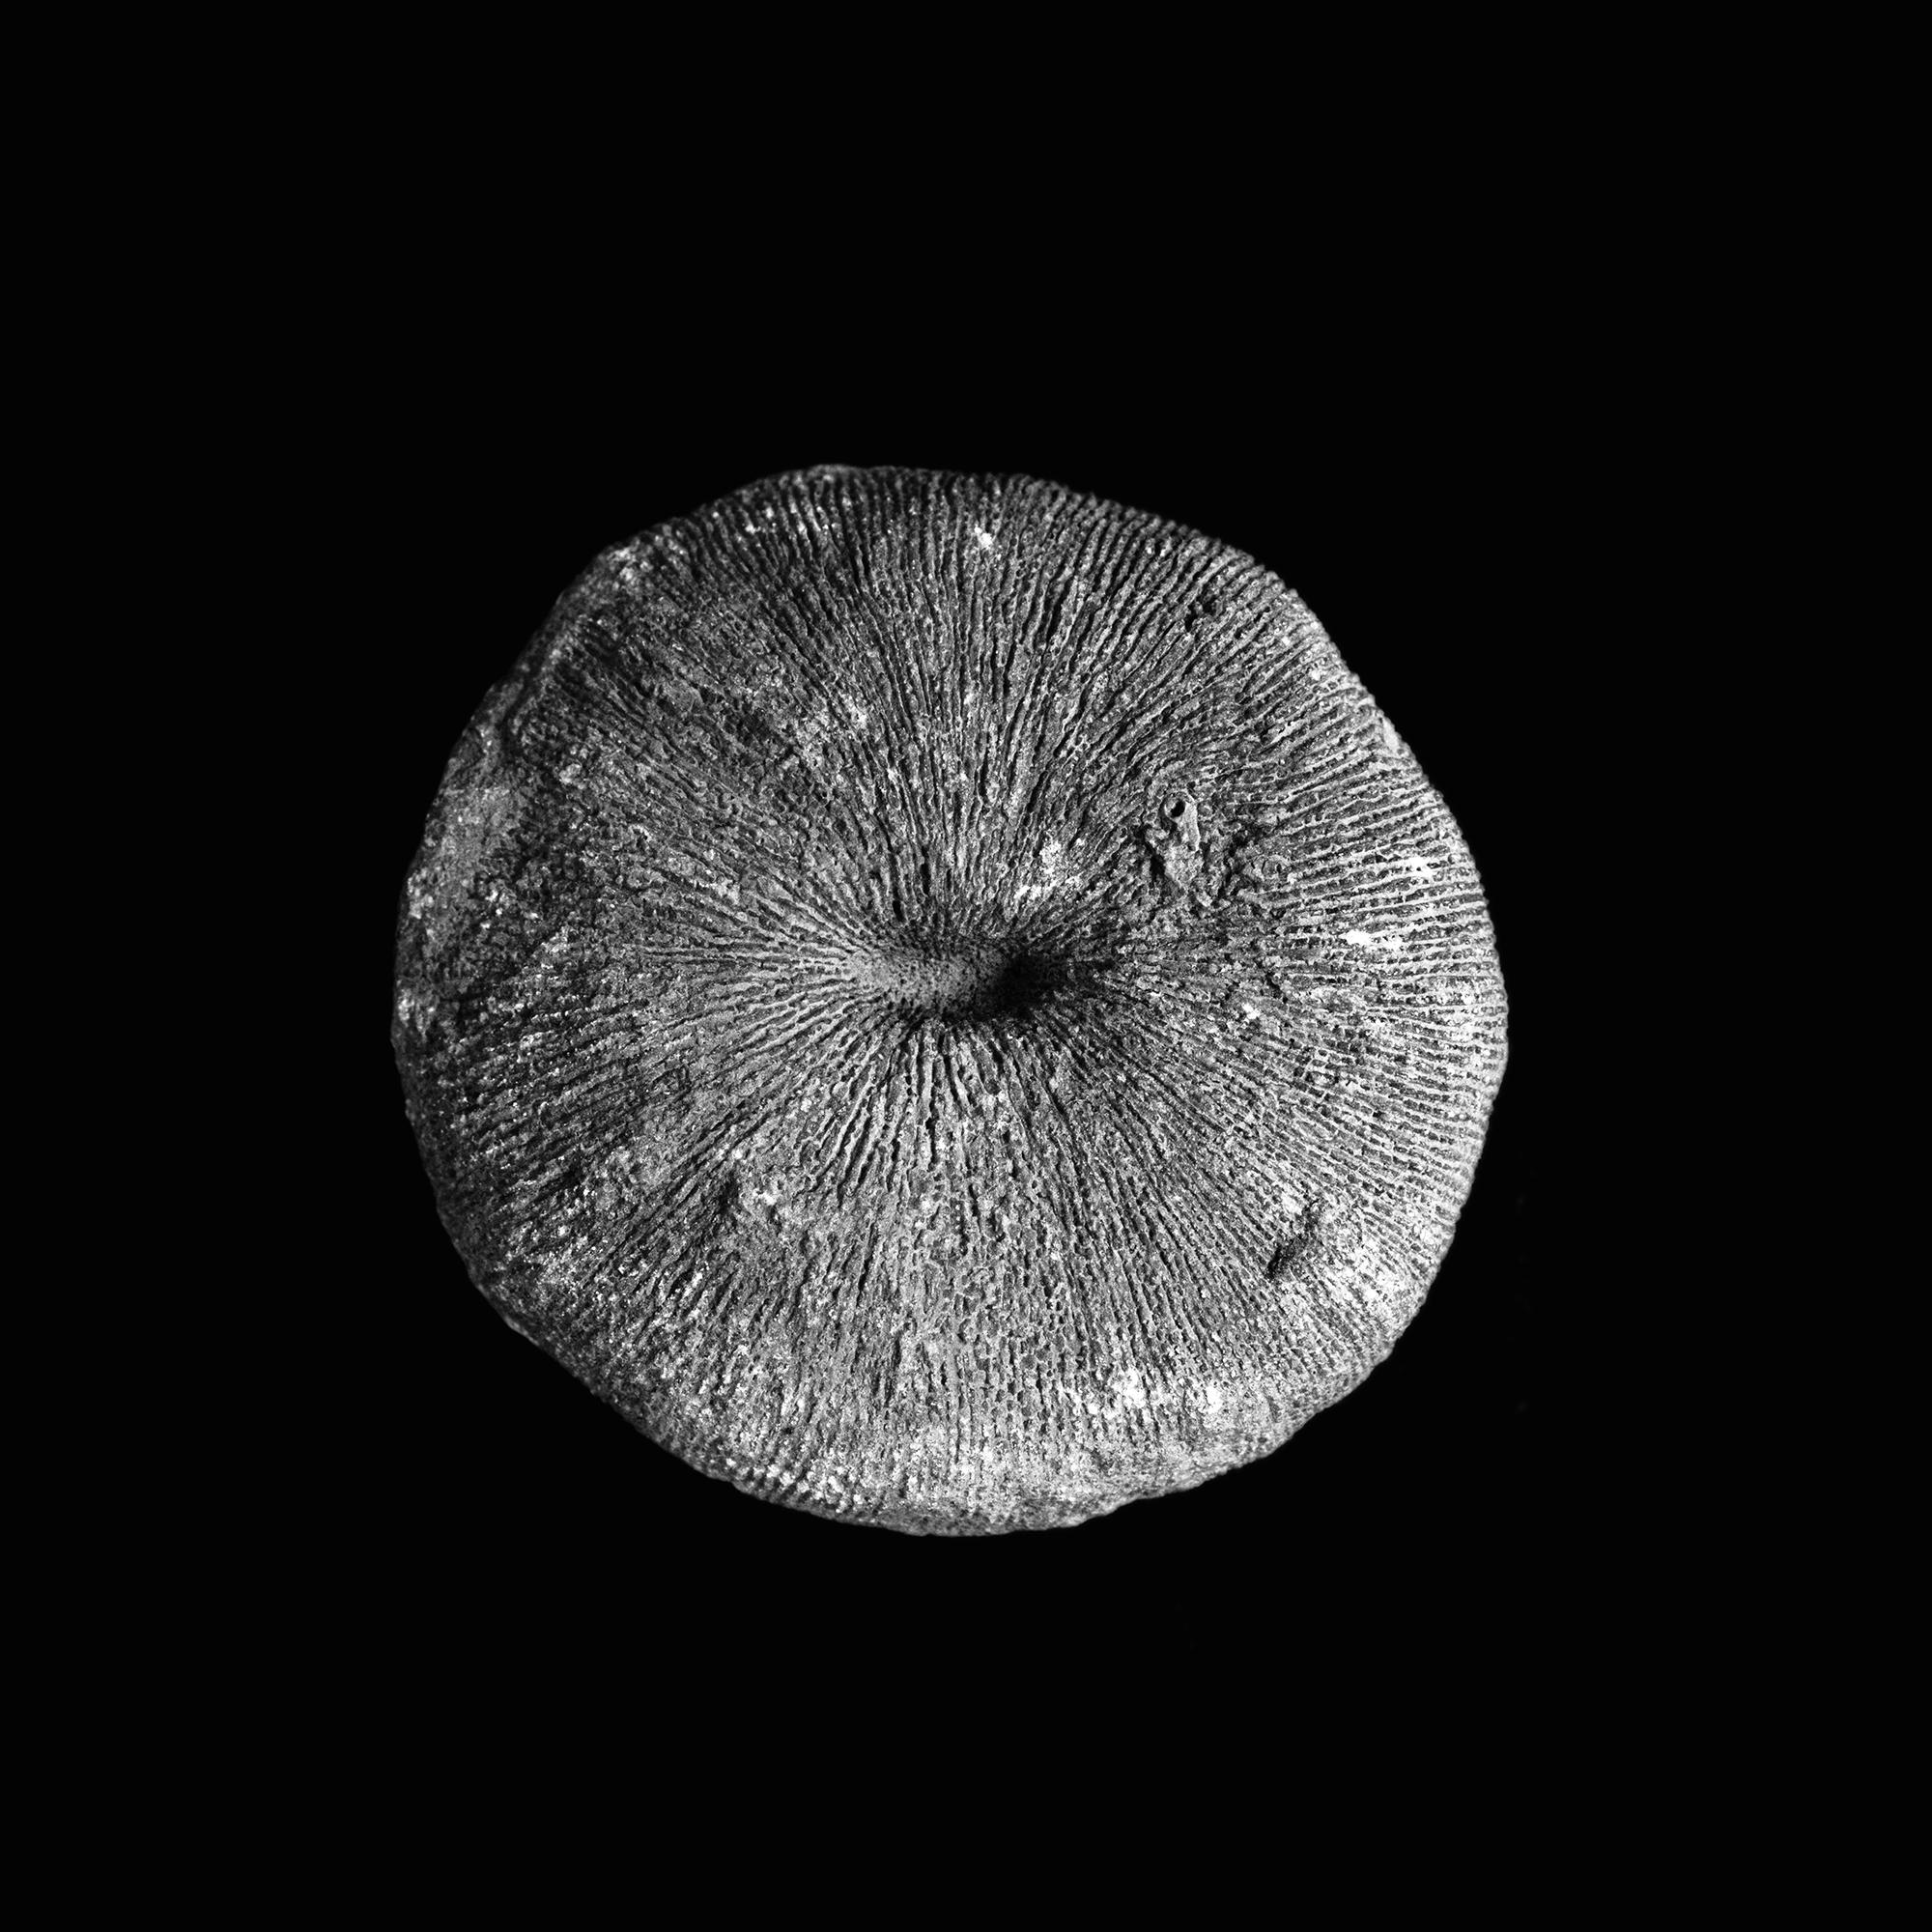 Cyclolites macrostoma, Kreide, Salzkammergut, Österreich